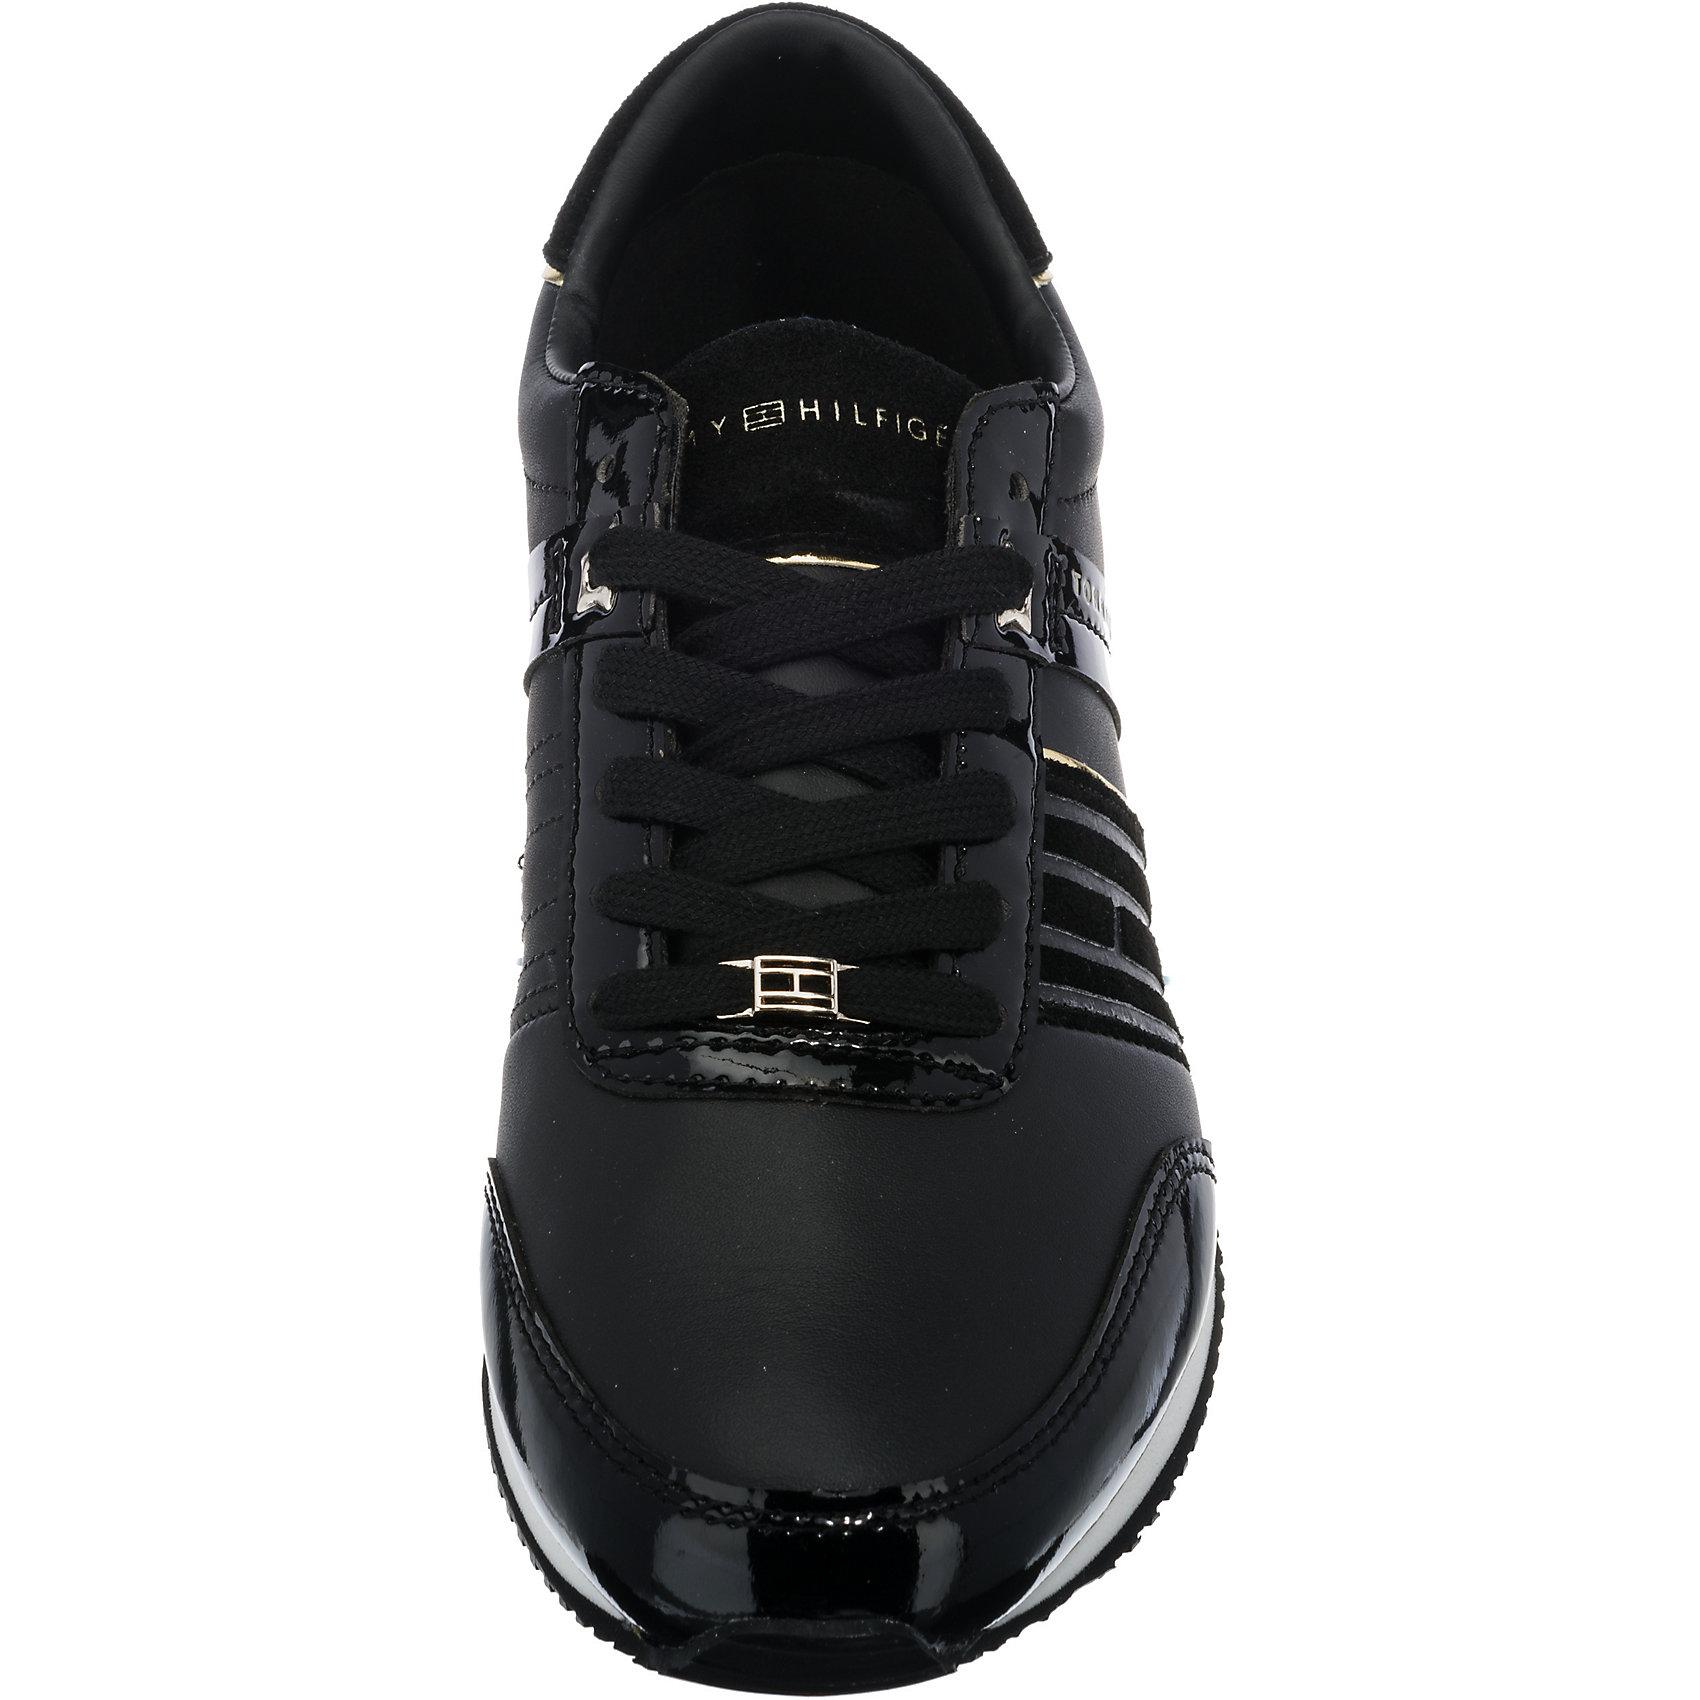 0c68a0b2da992d Neu TOMMY HILFIGER Phoenix Sneakers 7037300 für Damen rosa